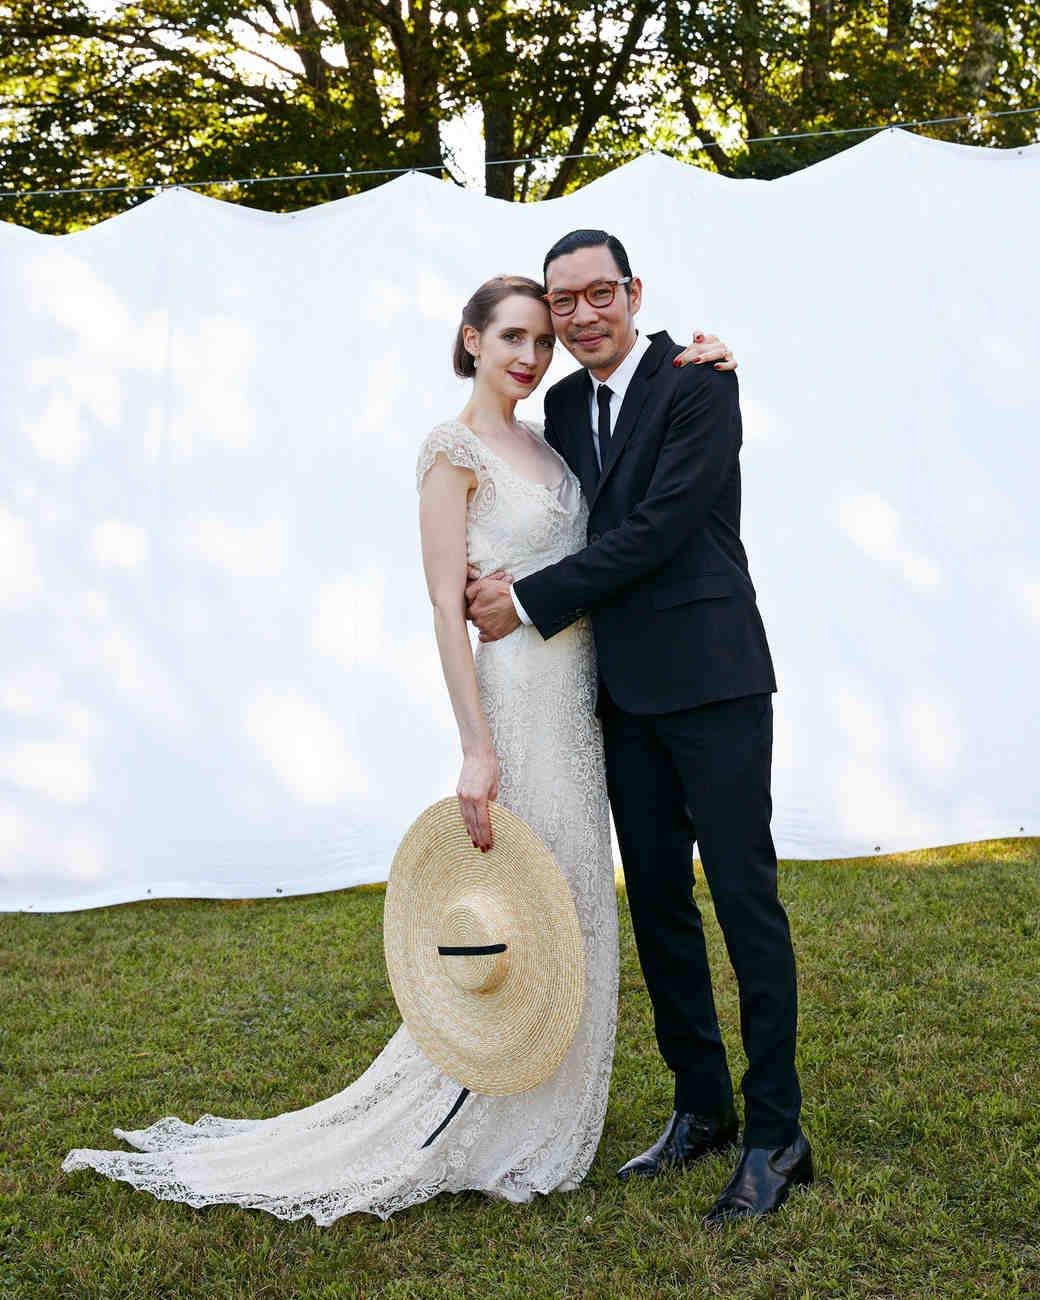 avril quy wedding new york couple white background